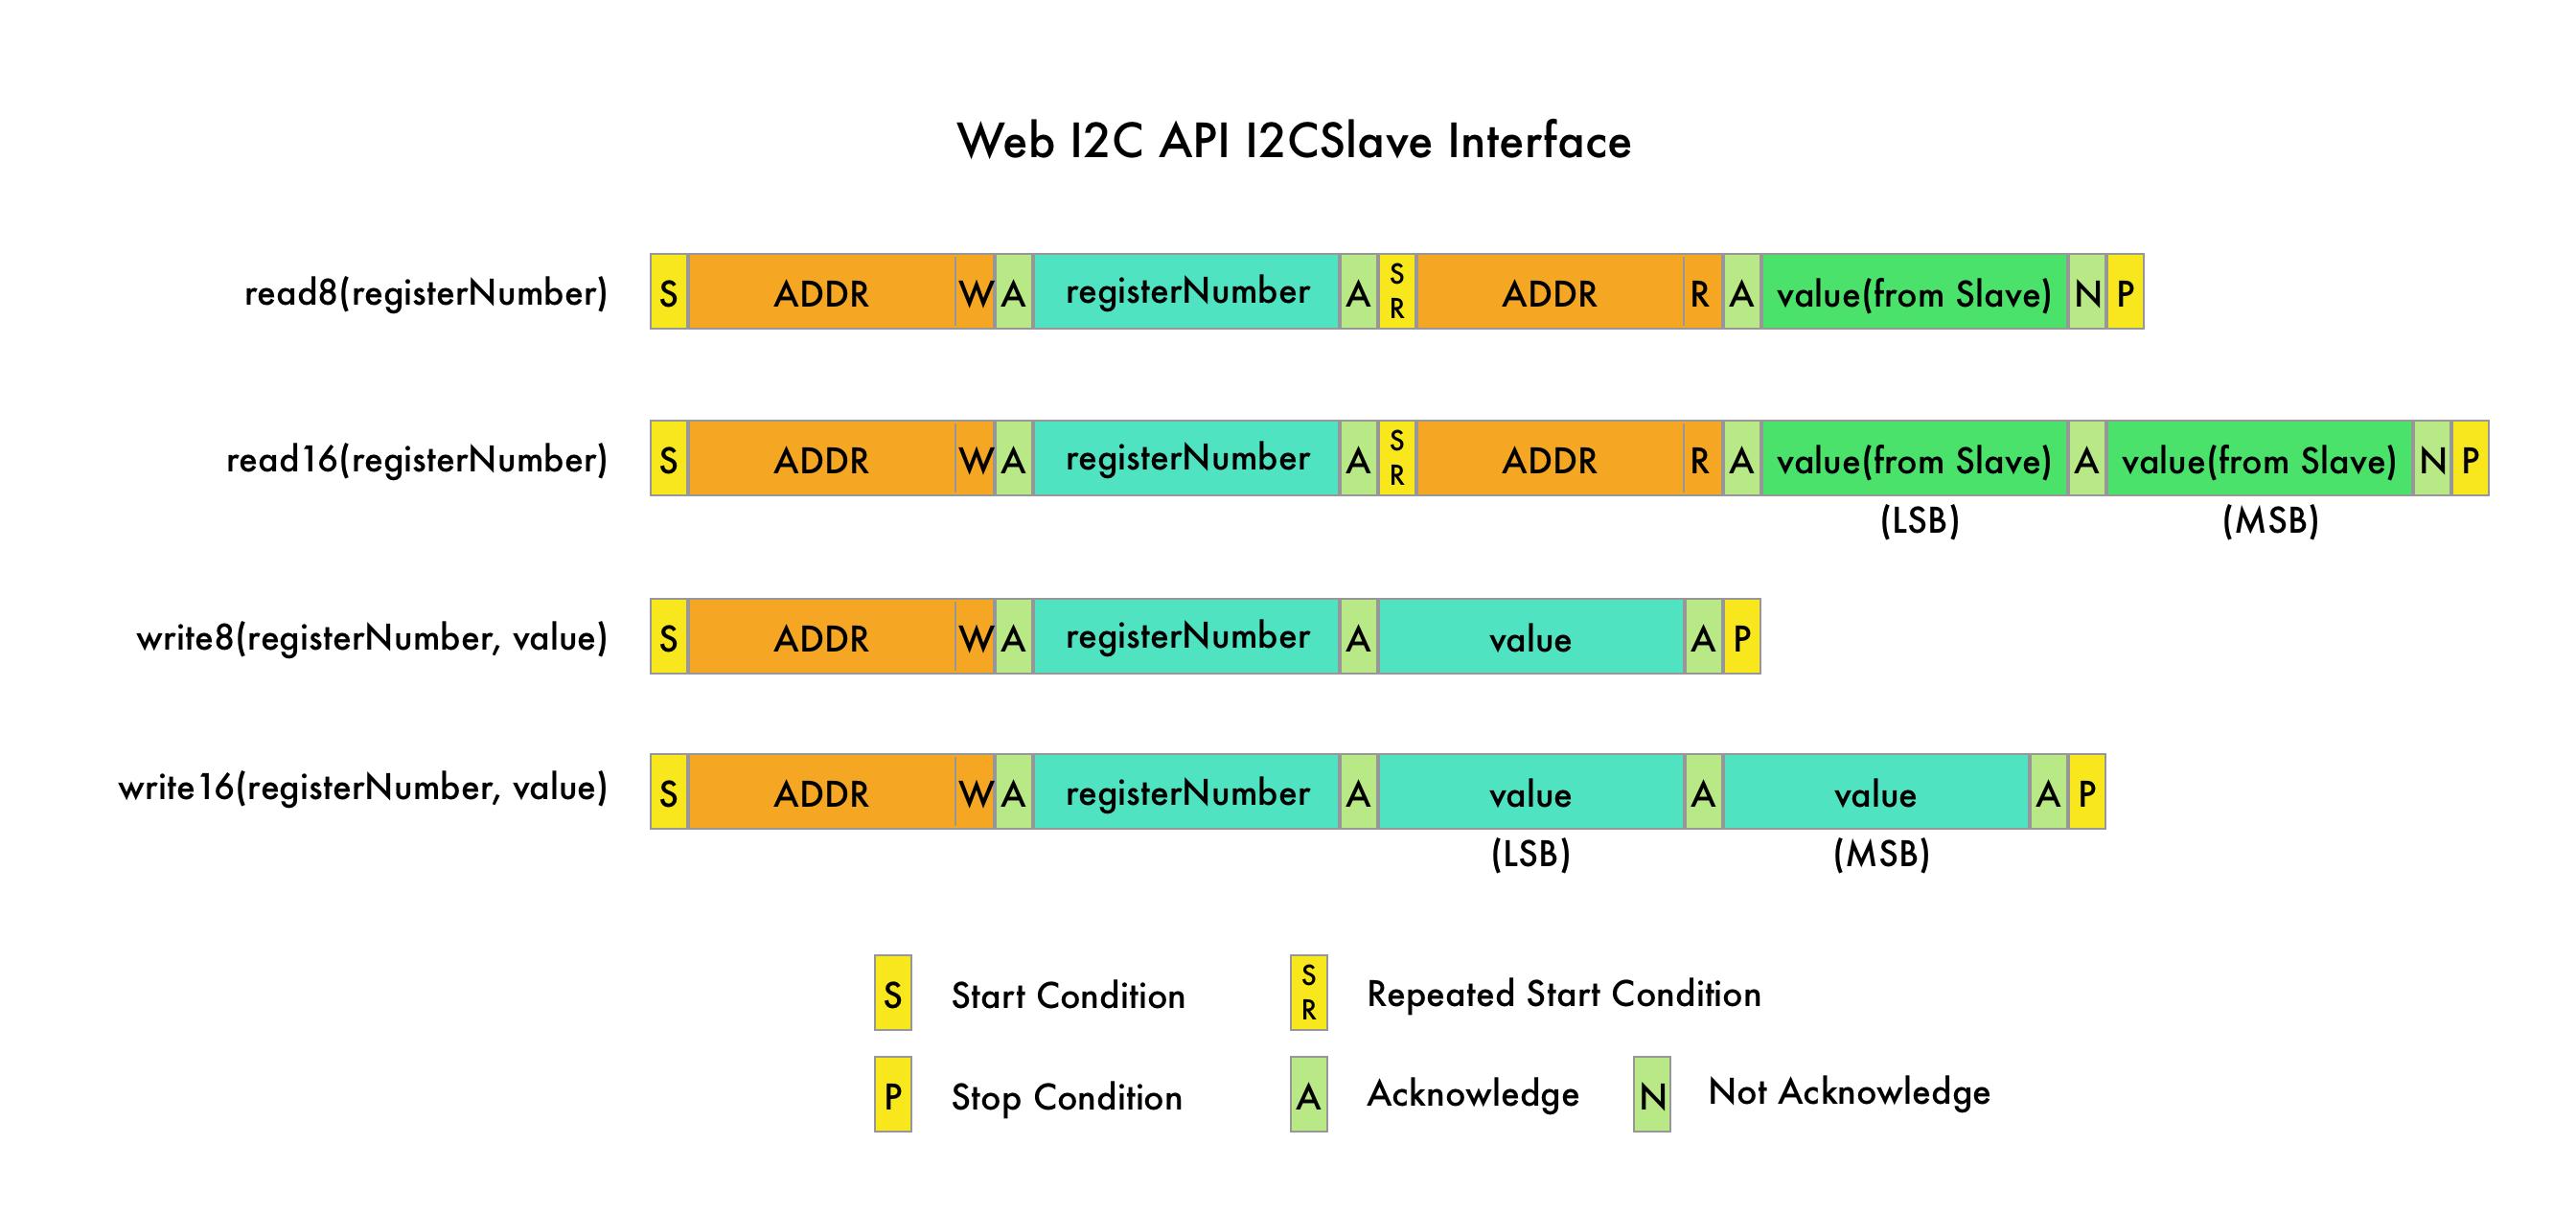 webI2c-I2CSlave-Interface@2x.png